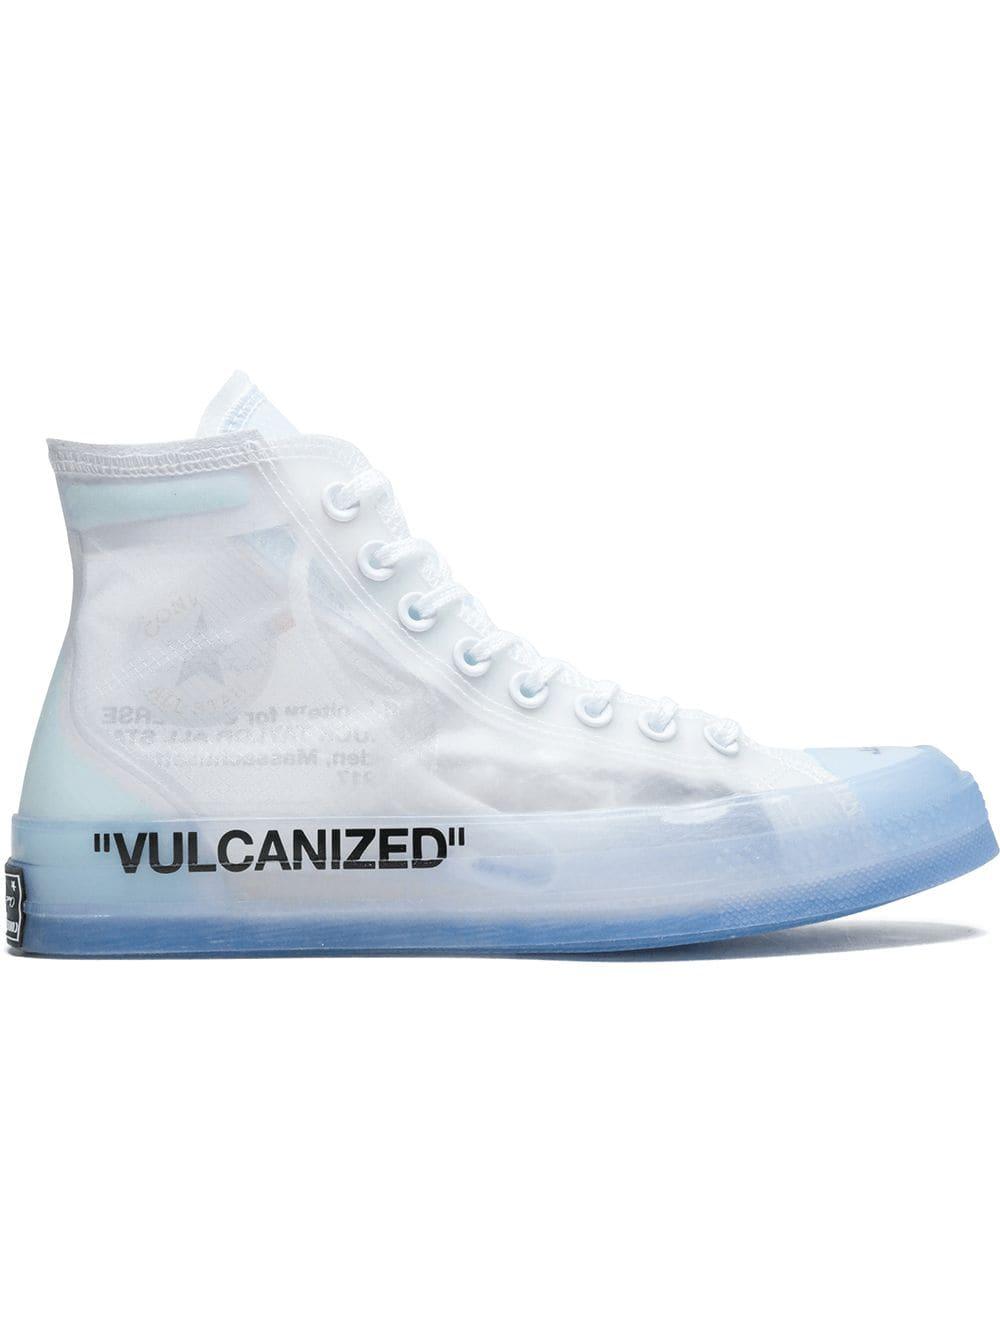 Converse Converse x Off White Chuck 70 hi top sneakers